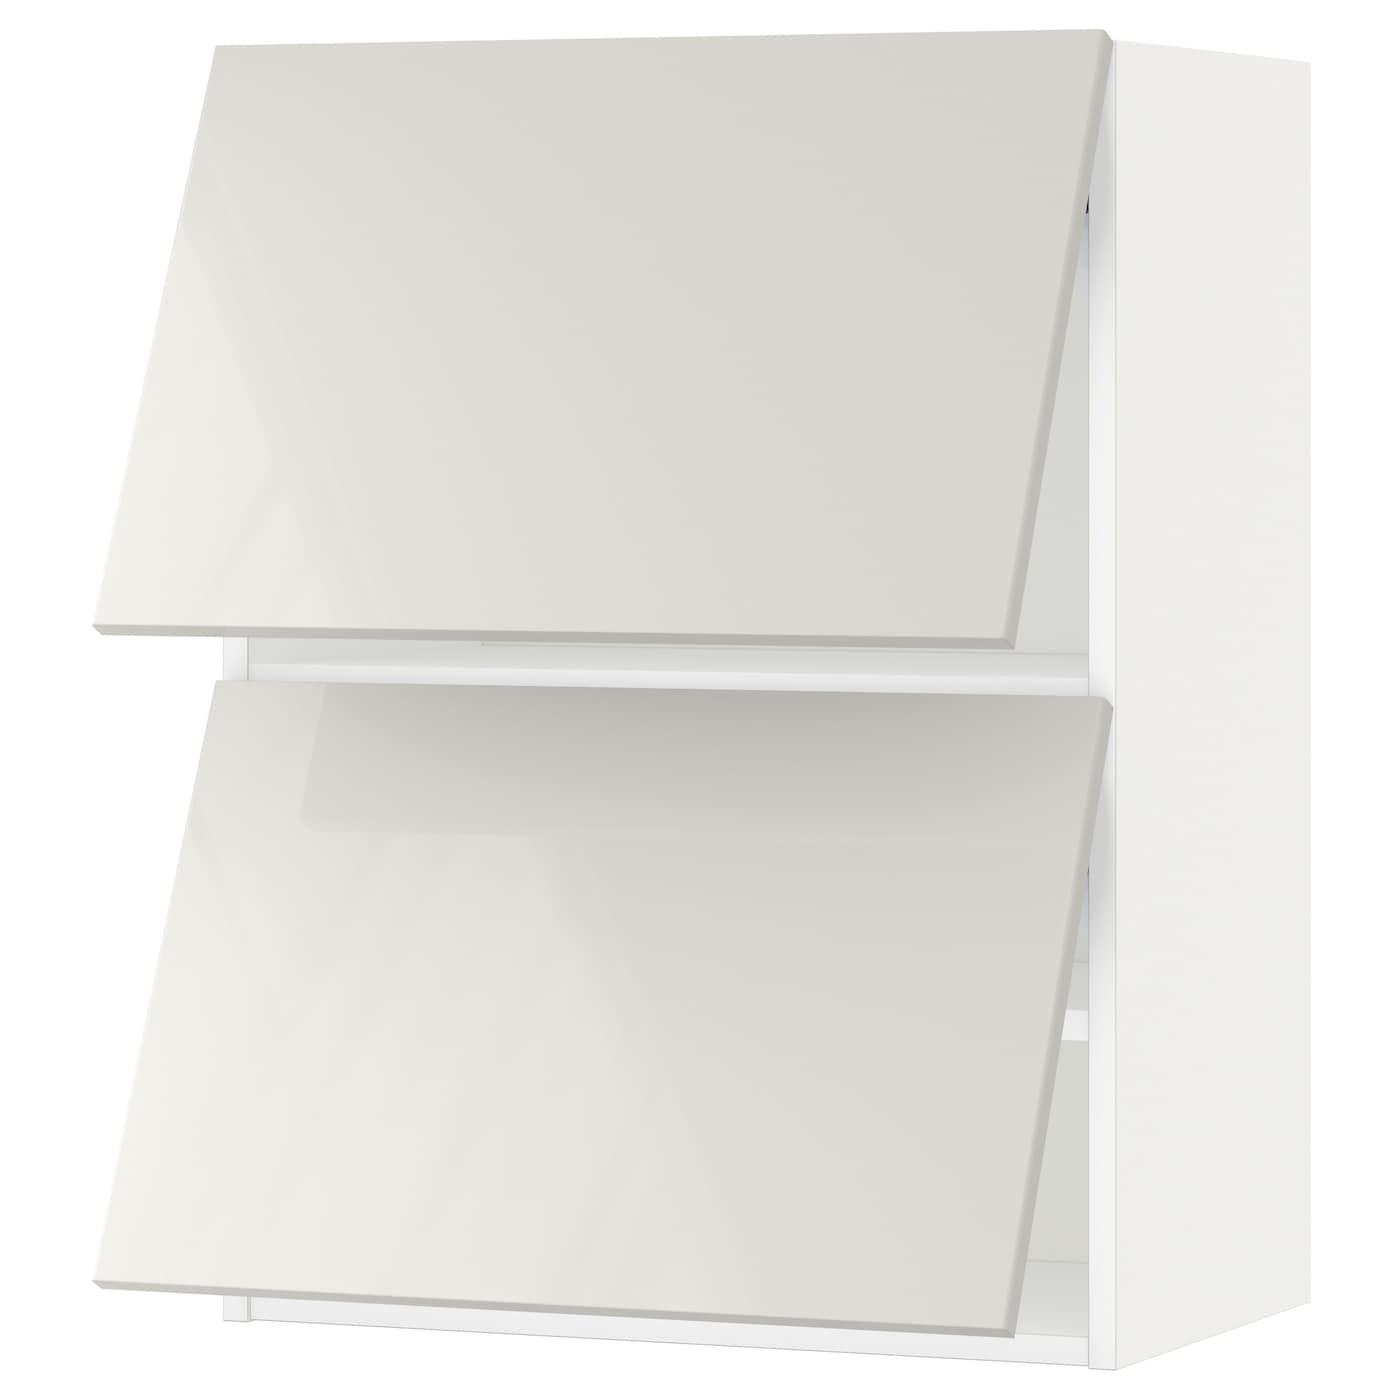 Ringhult Door High Gloss White 60 X 80 Cm: METOD Wall Cabinet Horizontal W 2 Doors White/ringhult